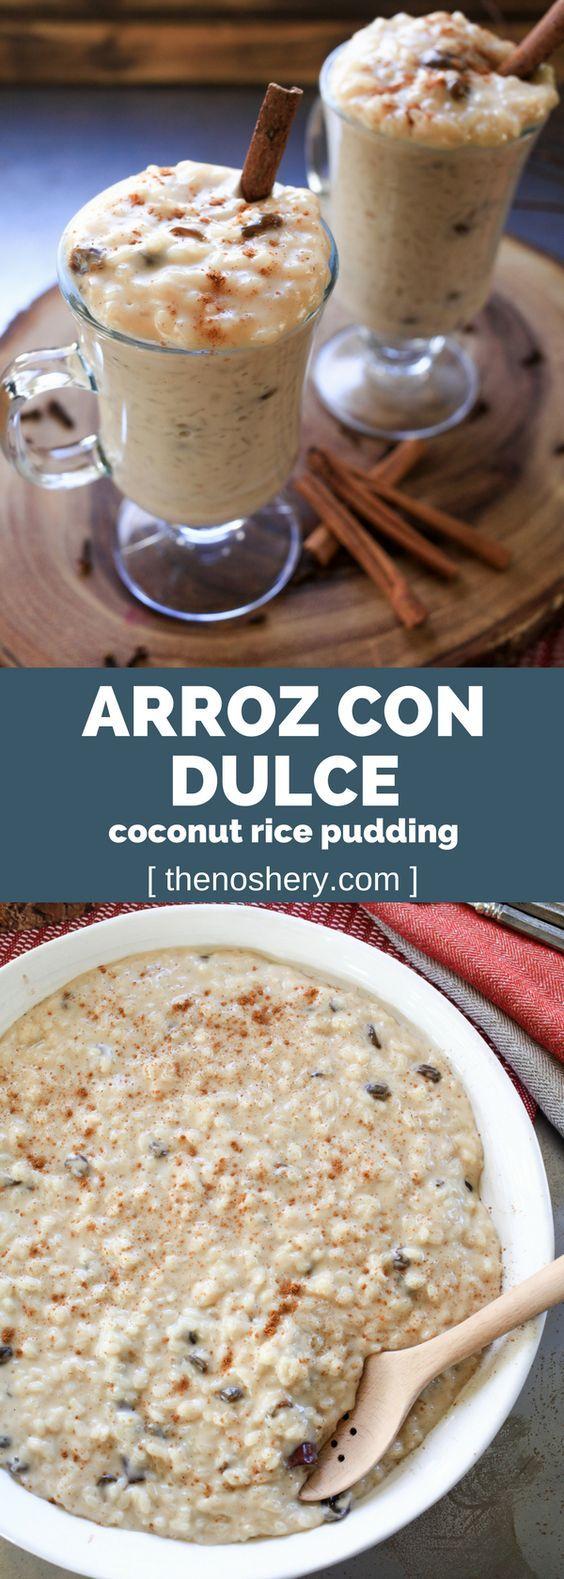 Arroz Con Dulce (Coconut Rice Pudding) | The Noshery